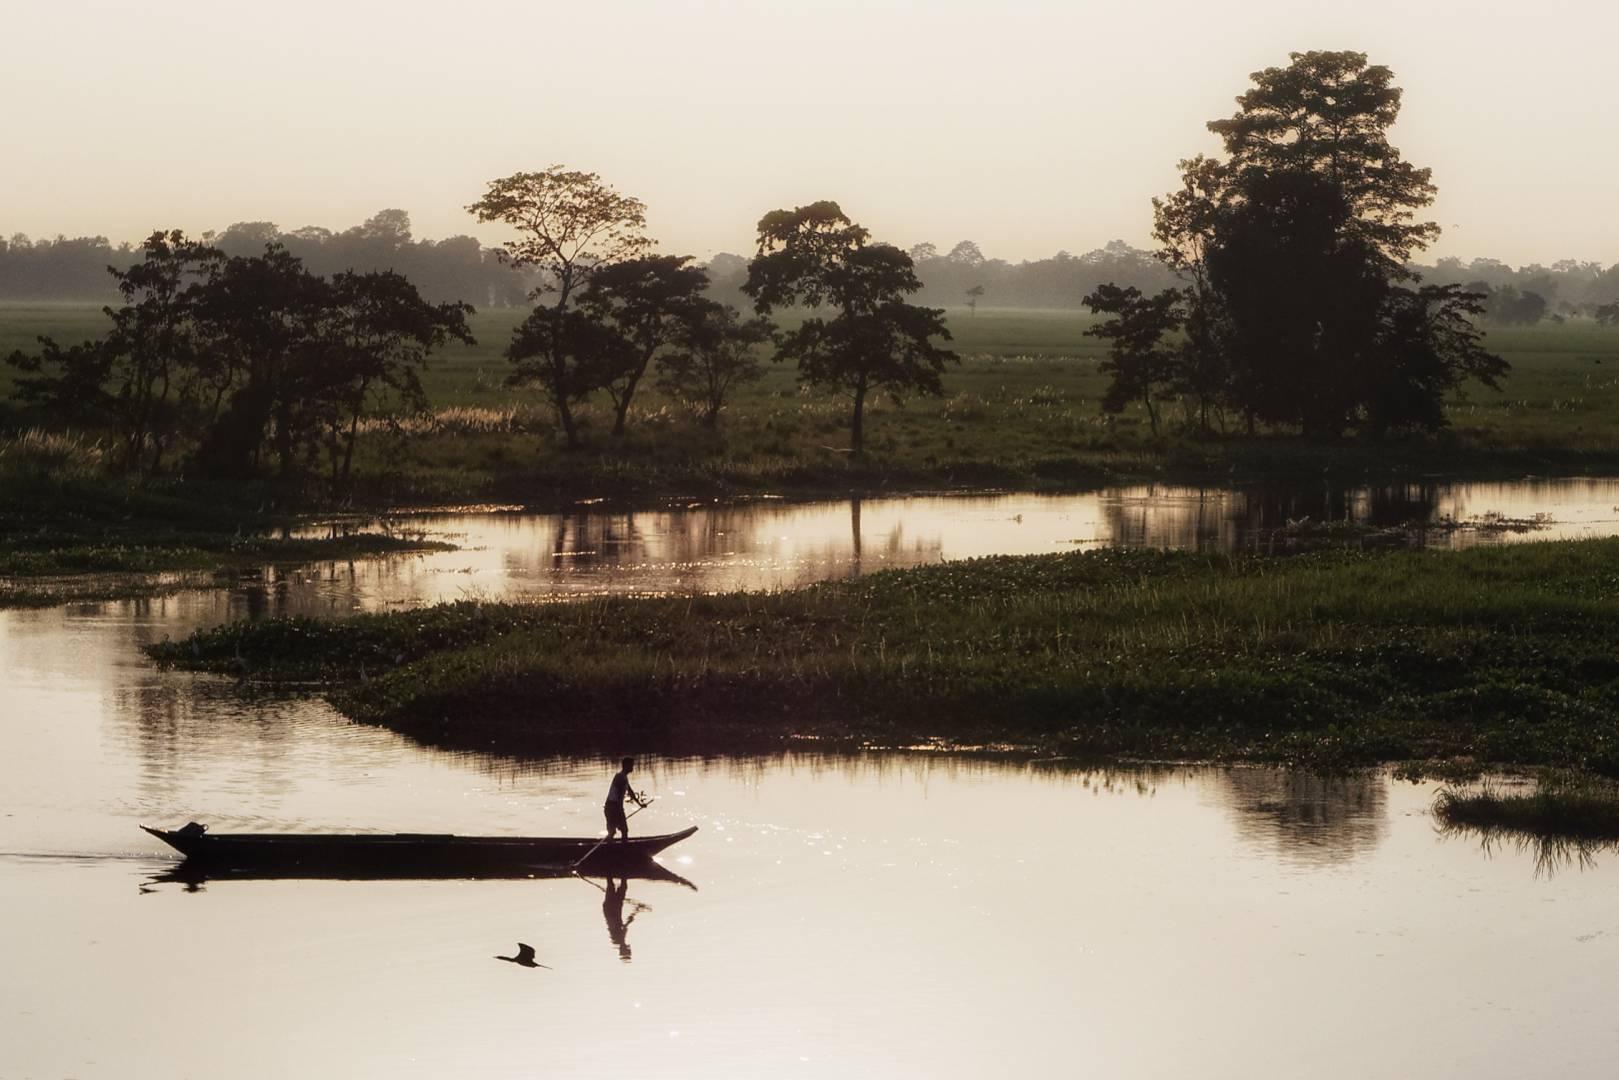 Majuli is a wetland vulnerable to erosion